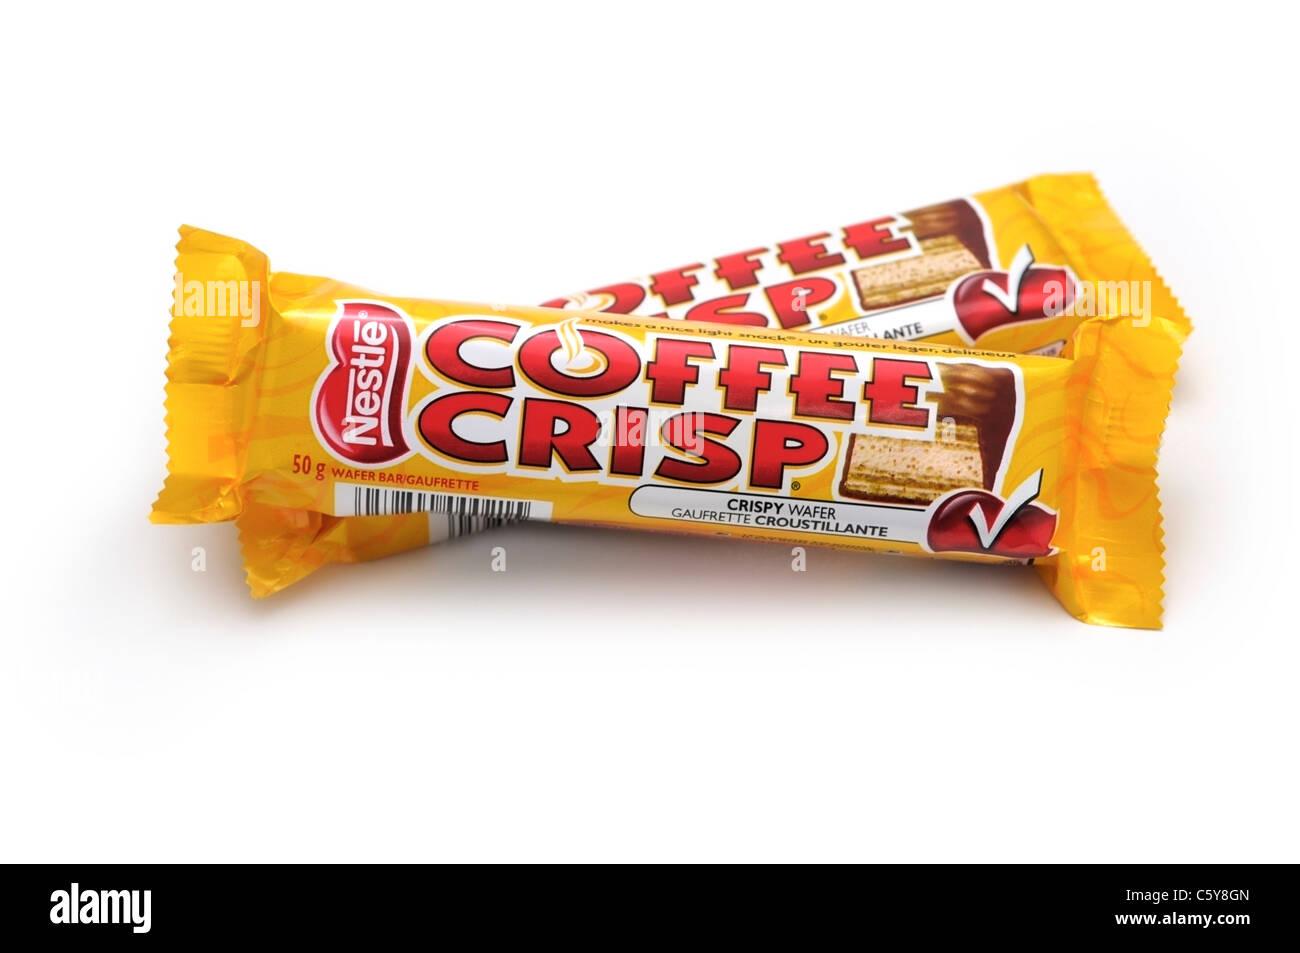 Coffee Crisp Snack Bars - Stock Image